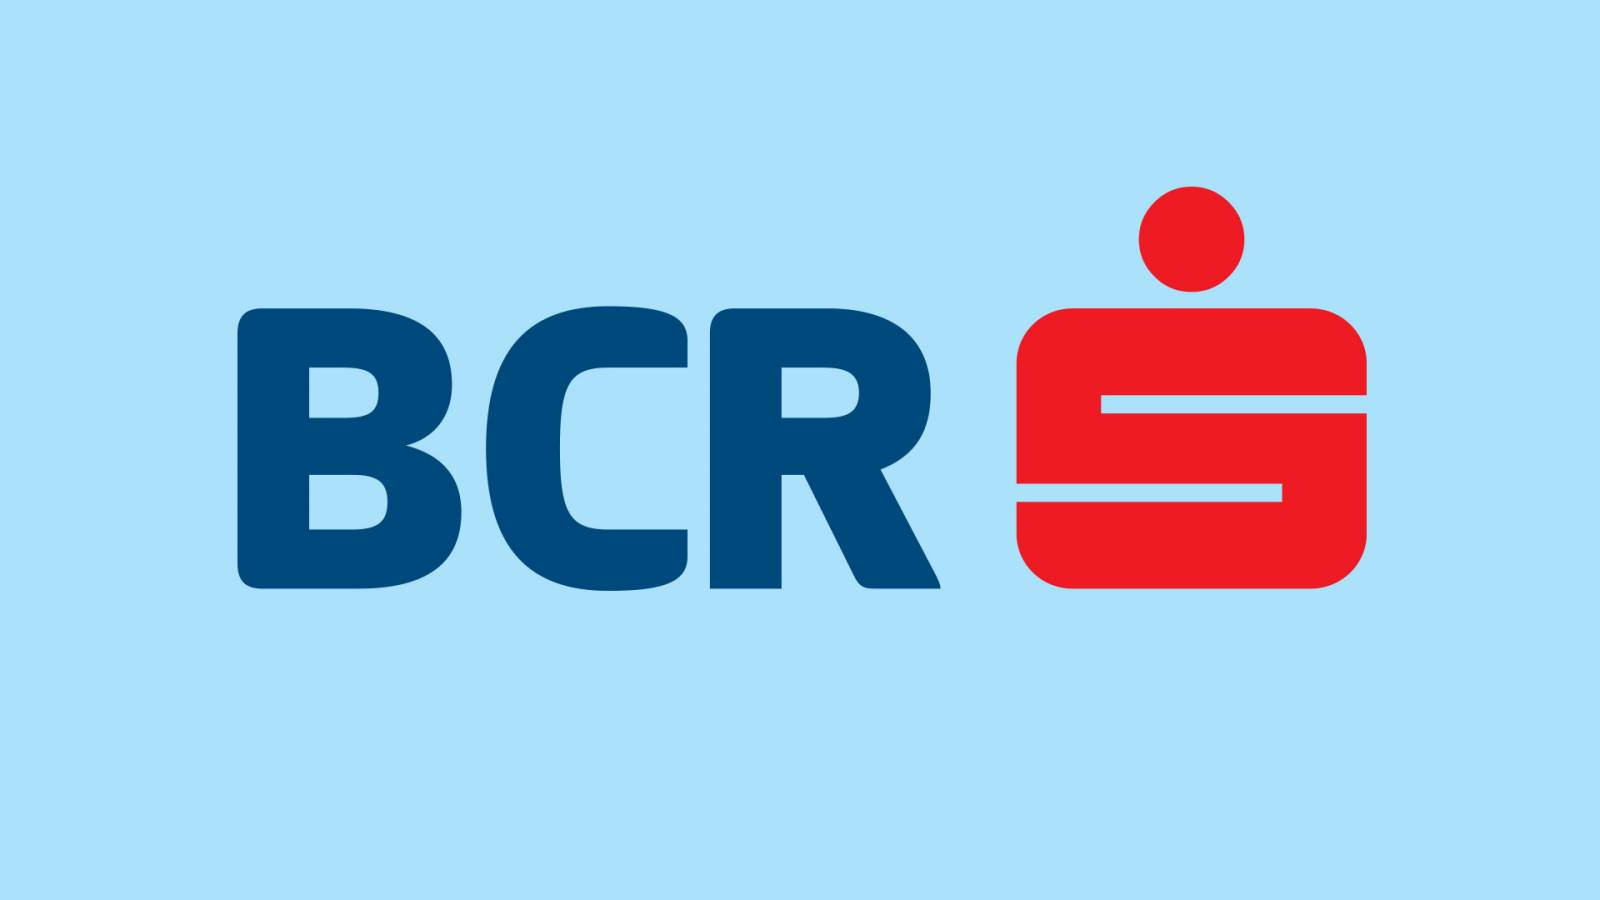 BCR Romania telefon